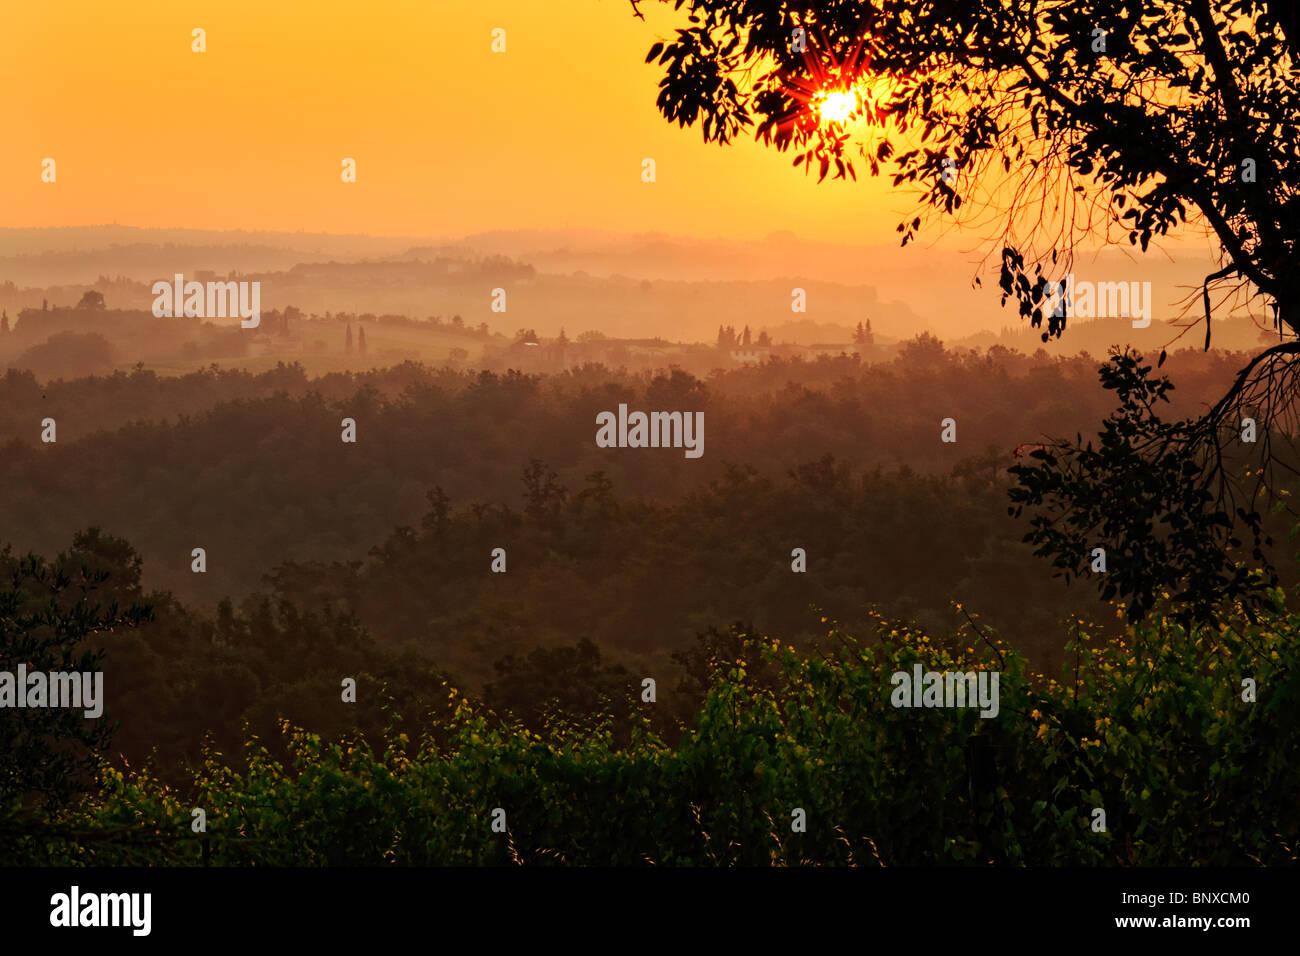 Paysage toscan entourant San Gimignano, Italie au lever du soleil Photo Stock